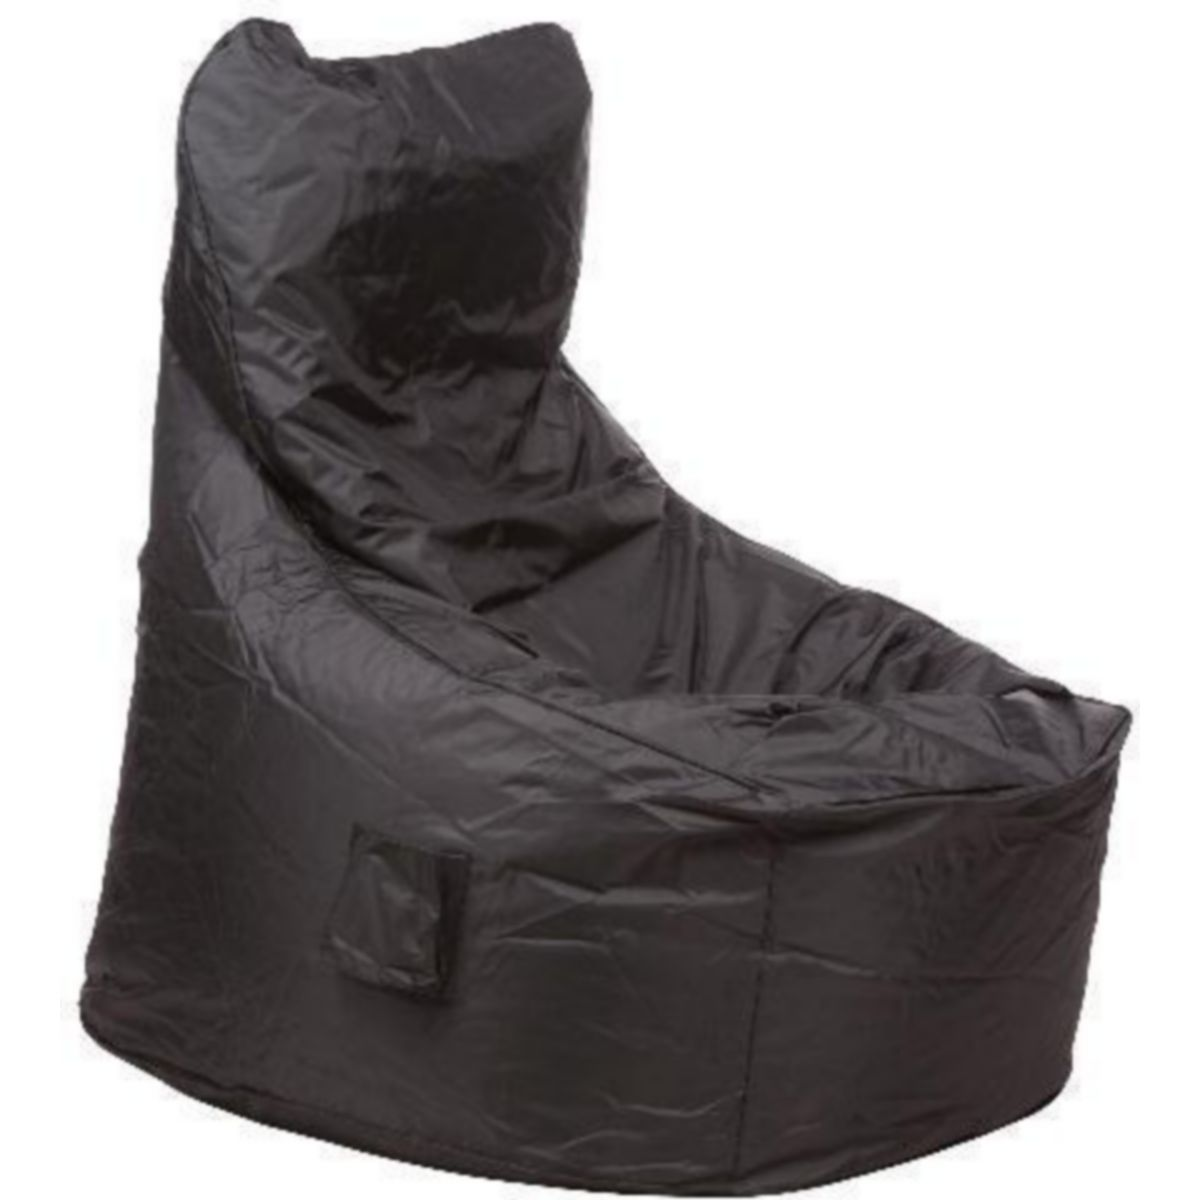 Sitzsack Sessel Comfort